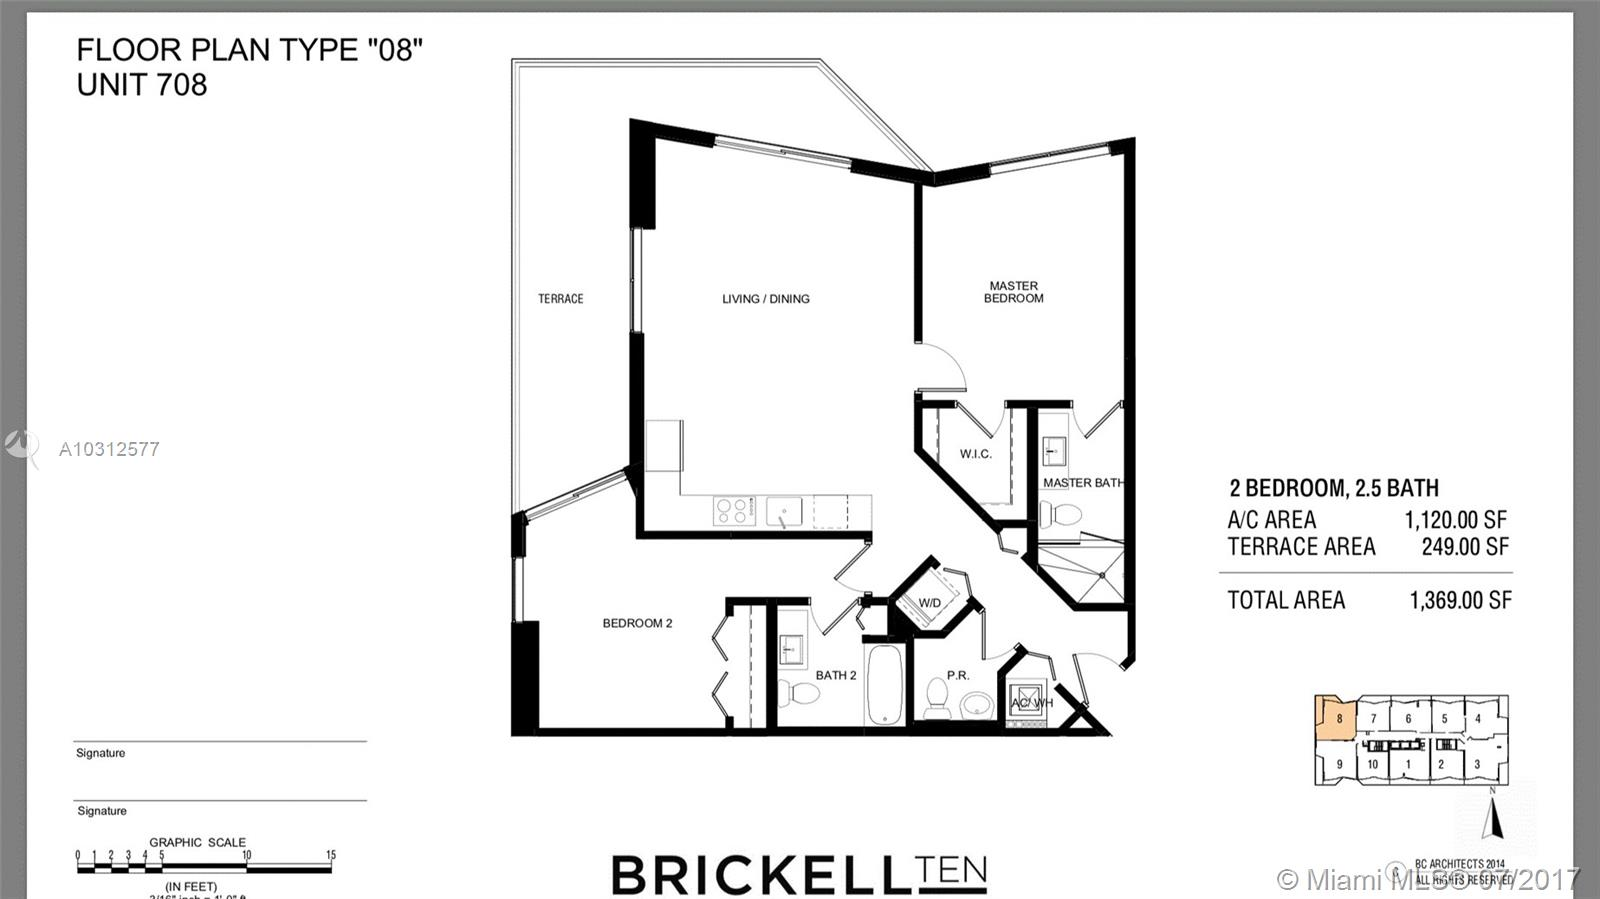 Brickell Ten image #21